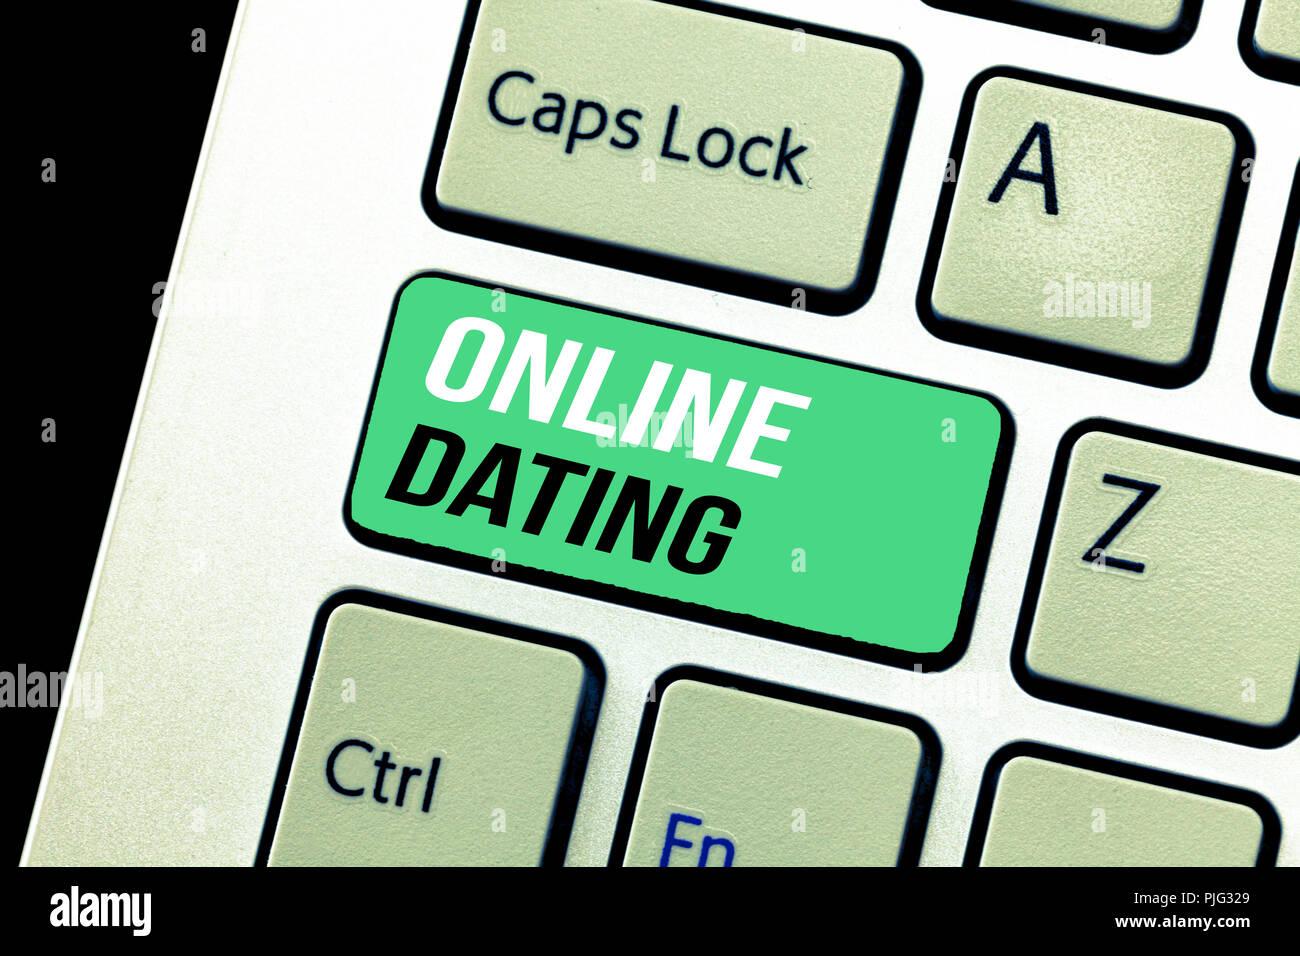 python programming build matchmaking website + geolocator